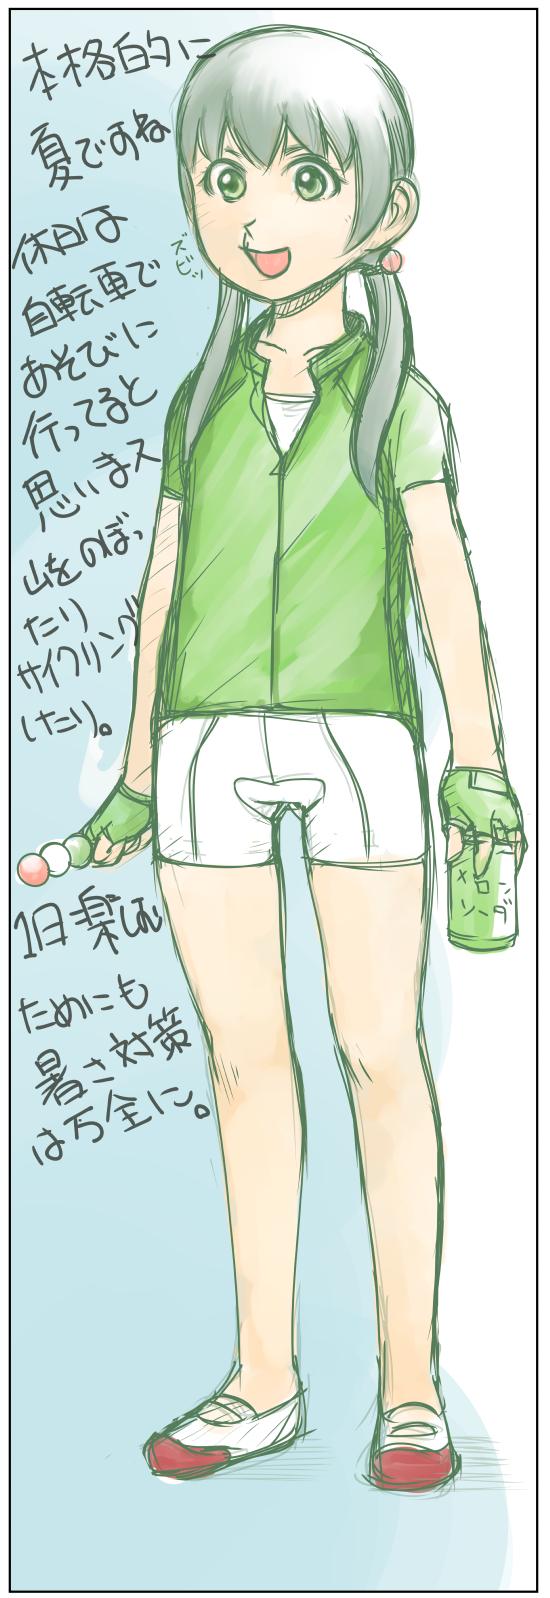 sansyokudanngochan-01.jpg